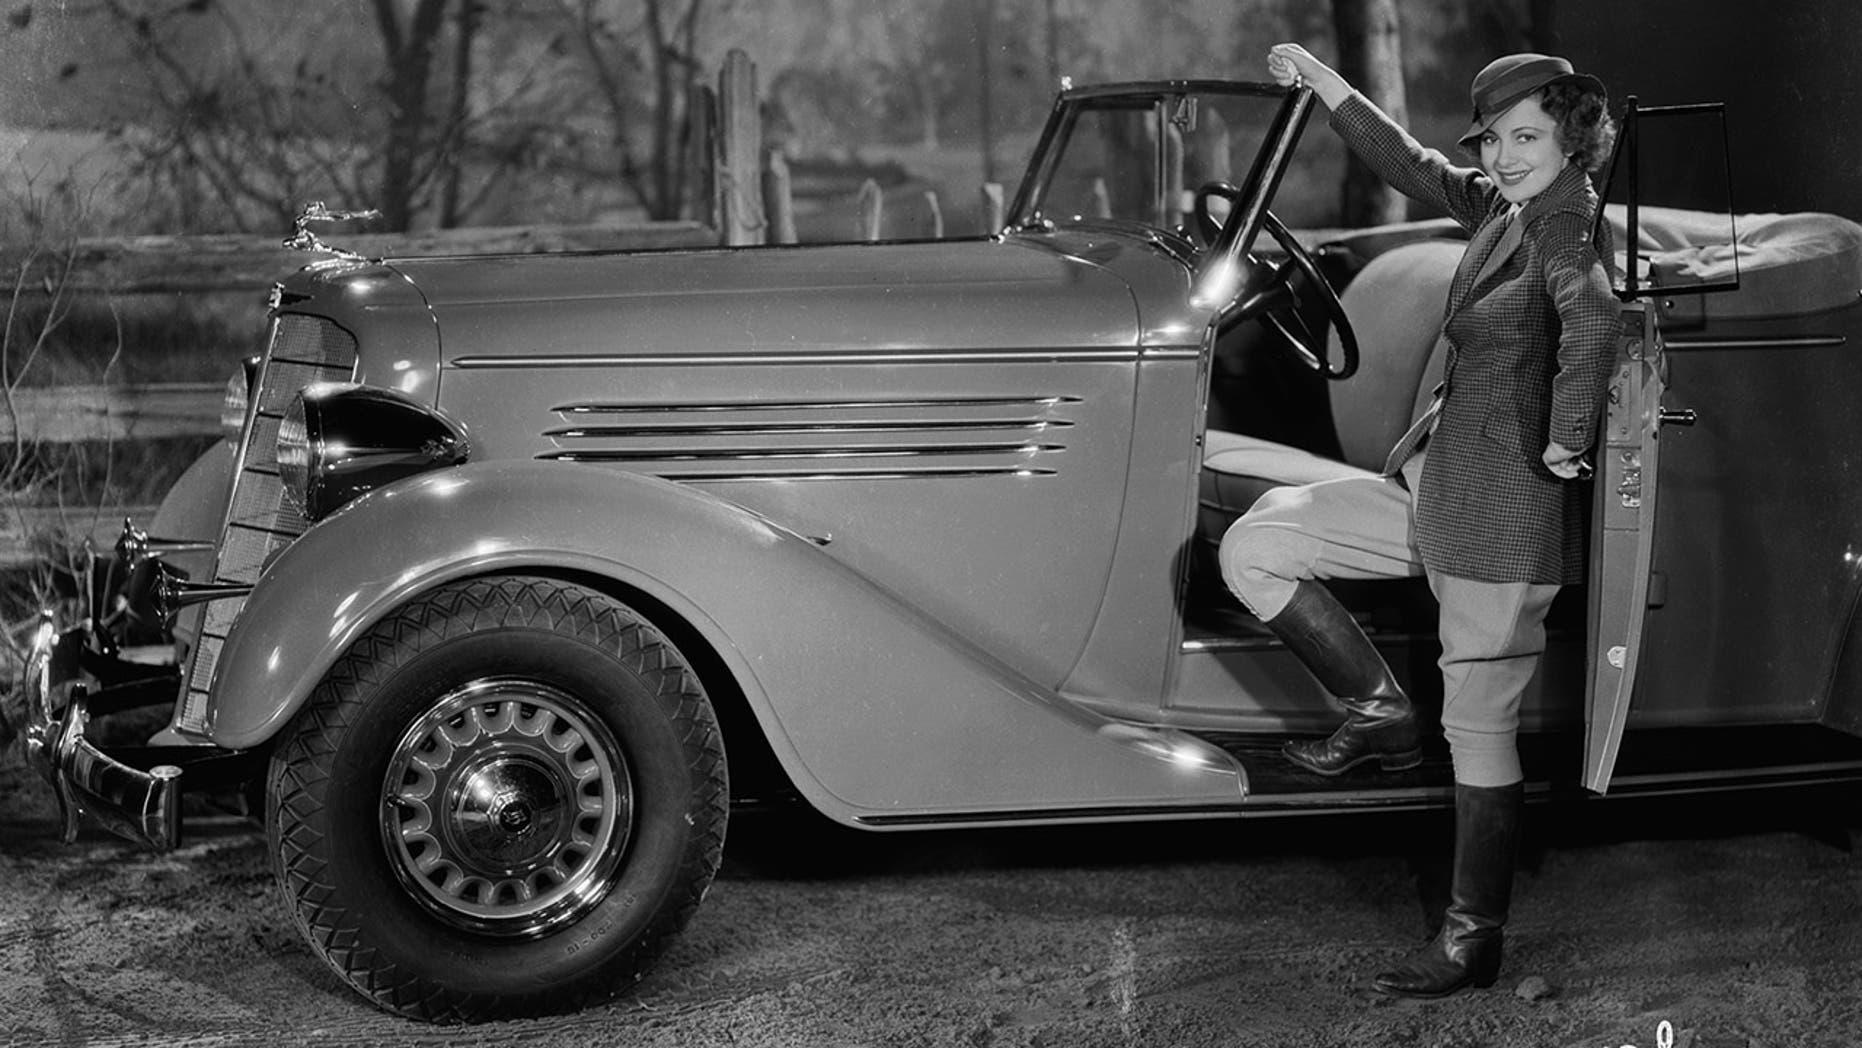 Olivia de Havilland's Buick